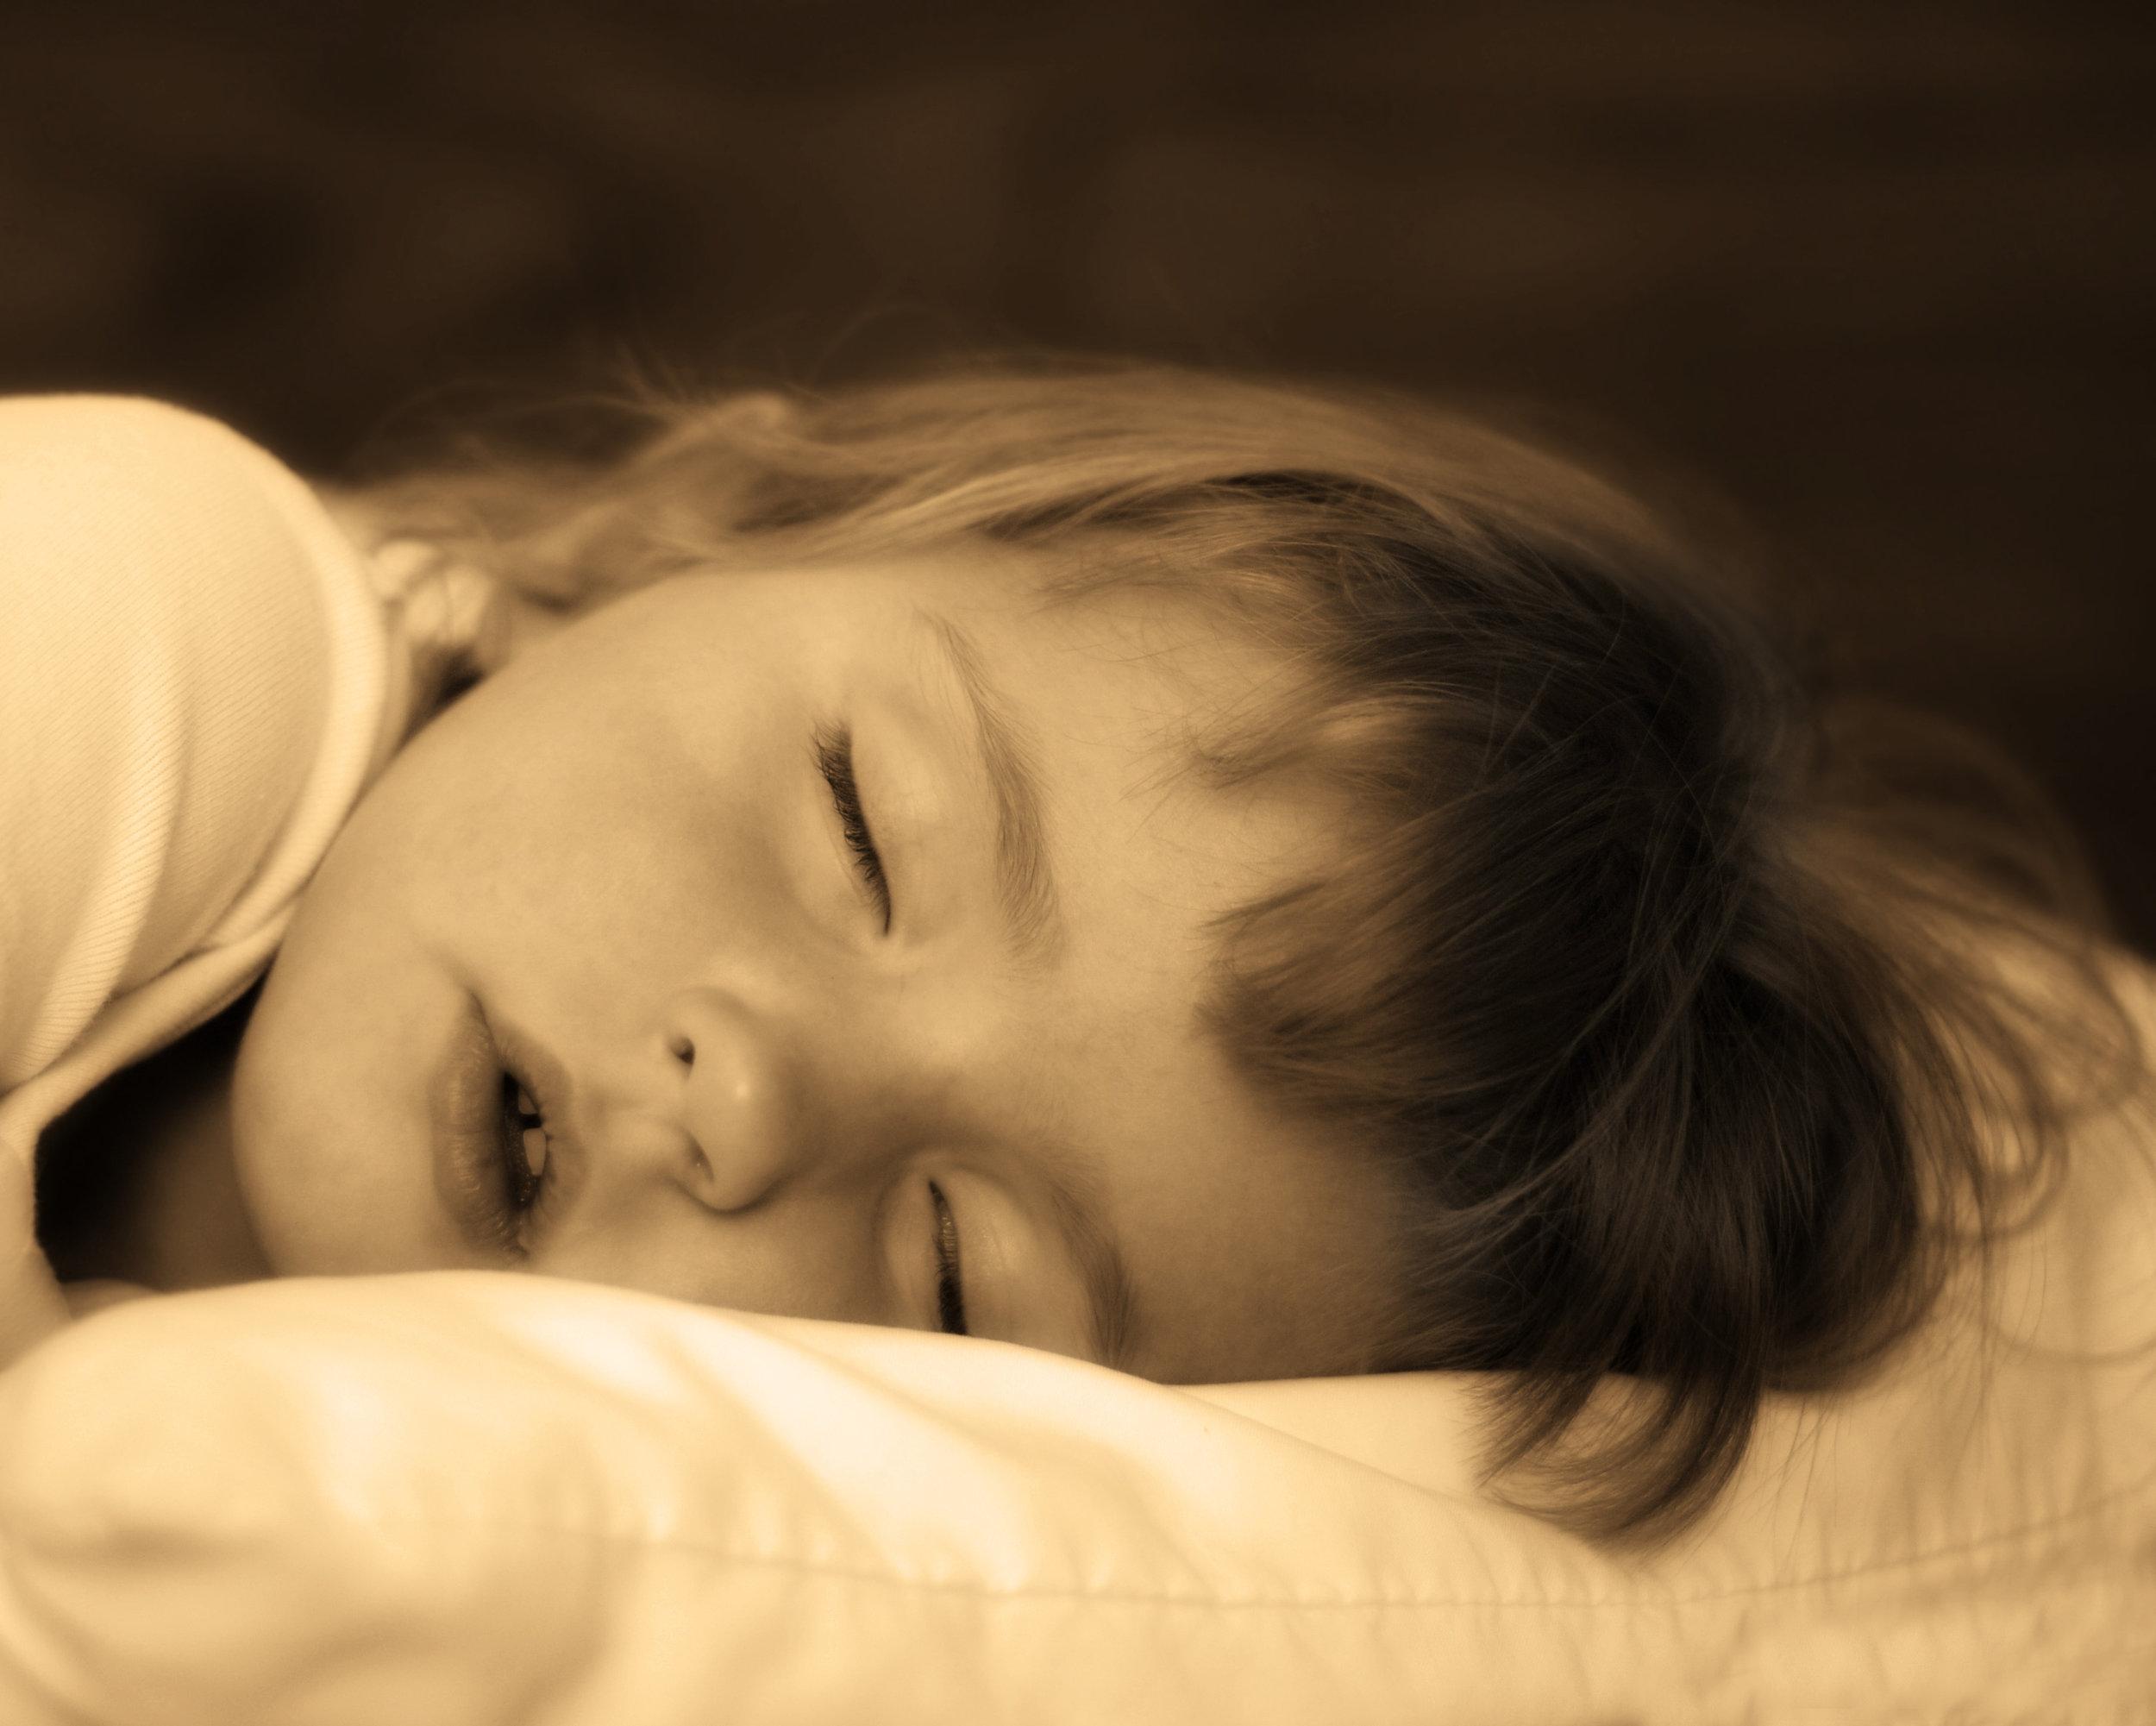 bigstock-Little-girl-sleeping-on-bed-wi-26175545.jpg